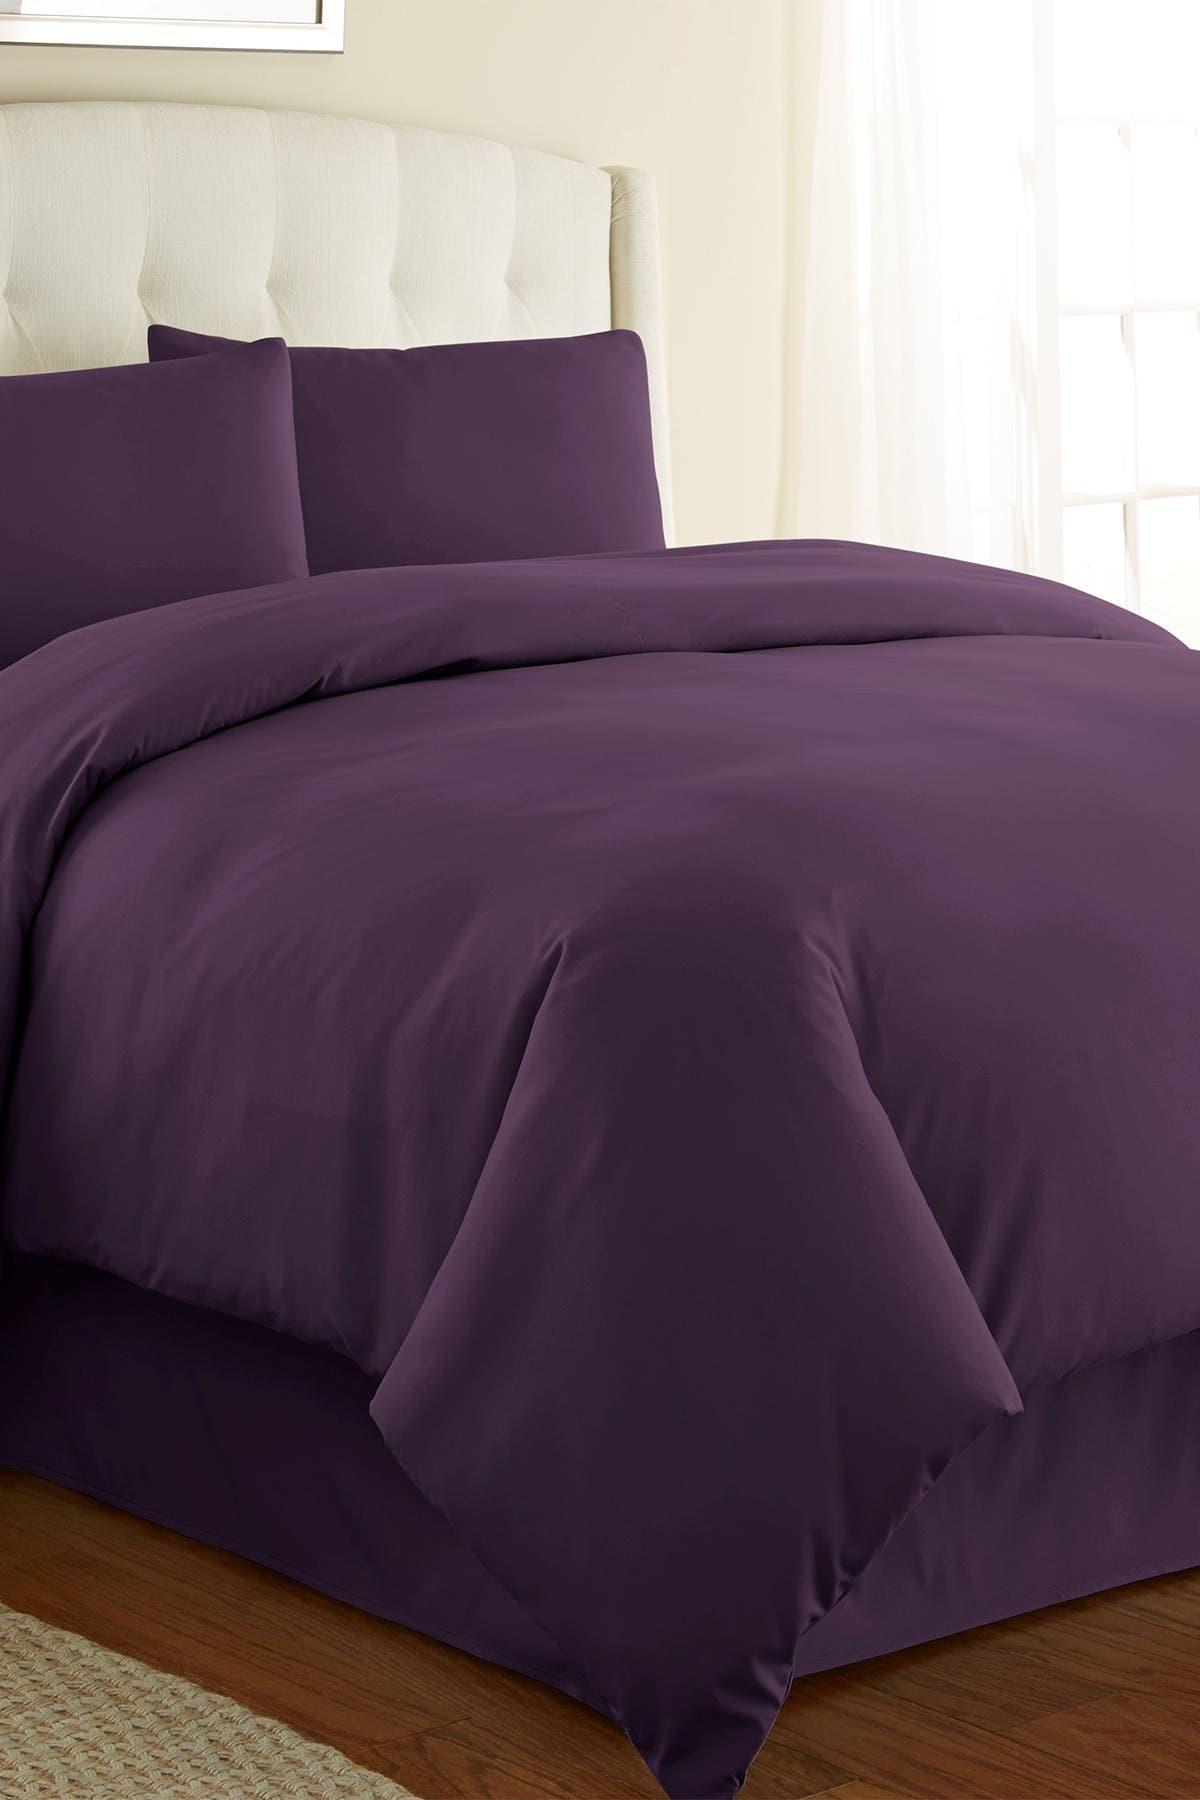 Image of SOUTHSHORE FINE LINENS King/California King Southshore Fine Linens Vilano Springs Duvet Cover Sets - Purple